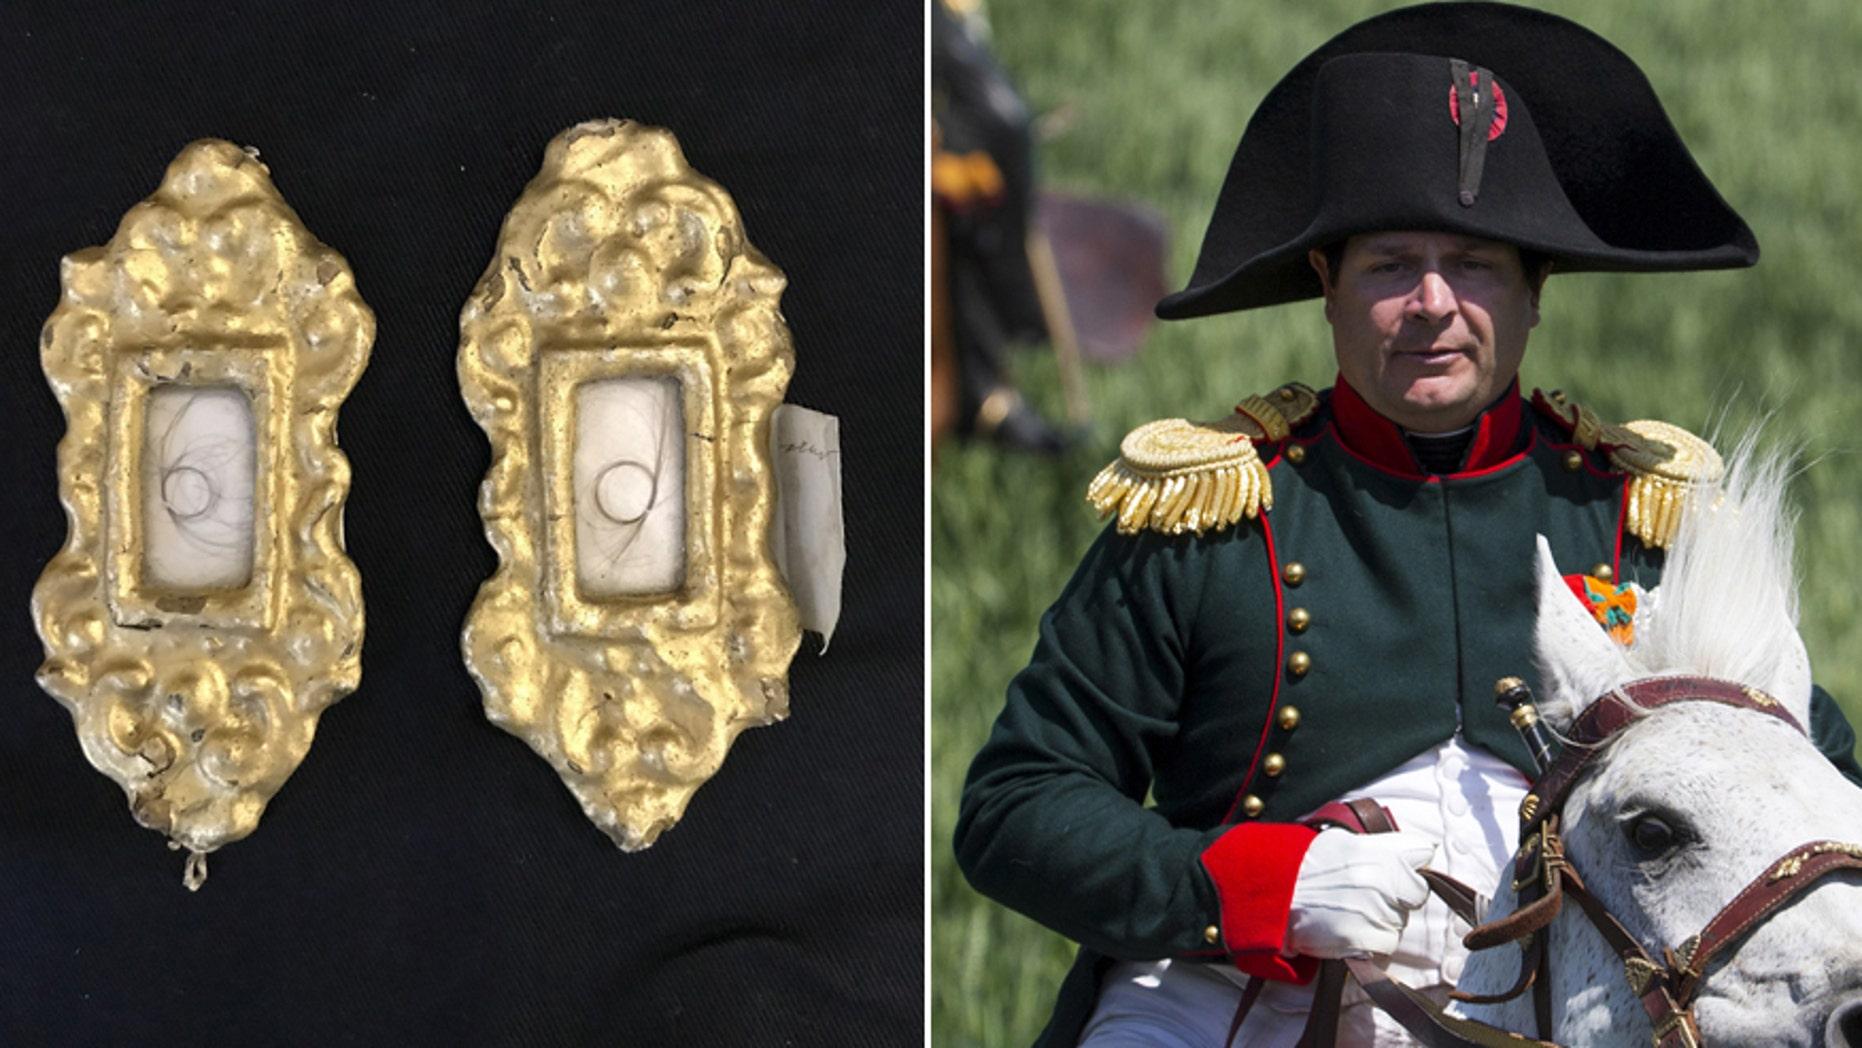 The Locket Containing Locks Of Hair From Napoleon And Empress Josephine Henry Aldridge